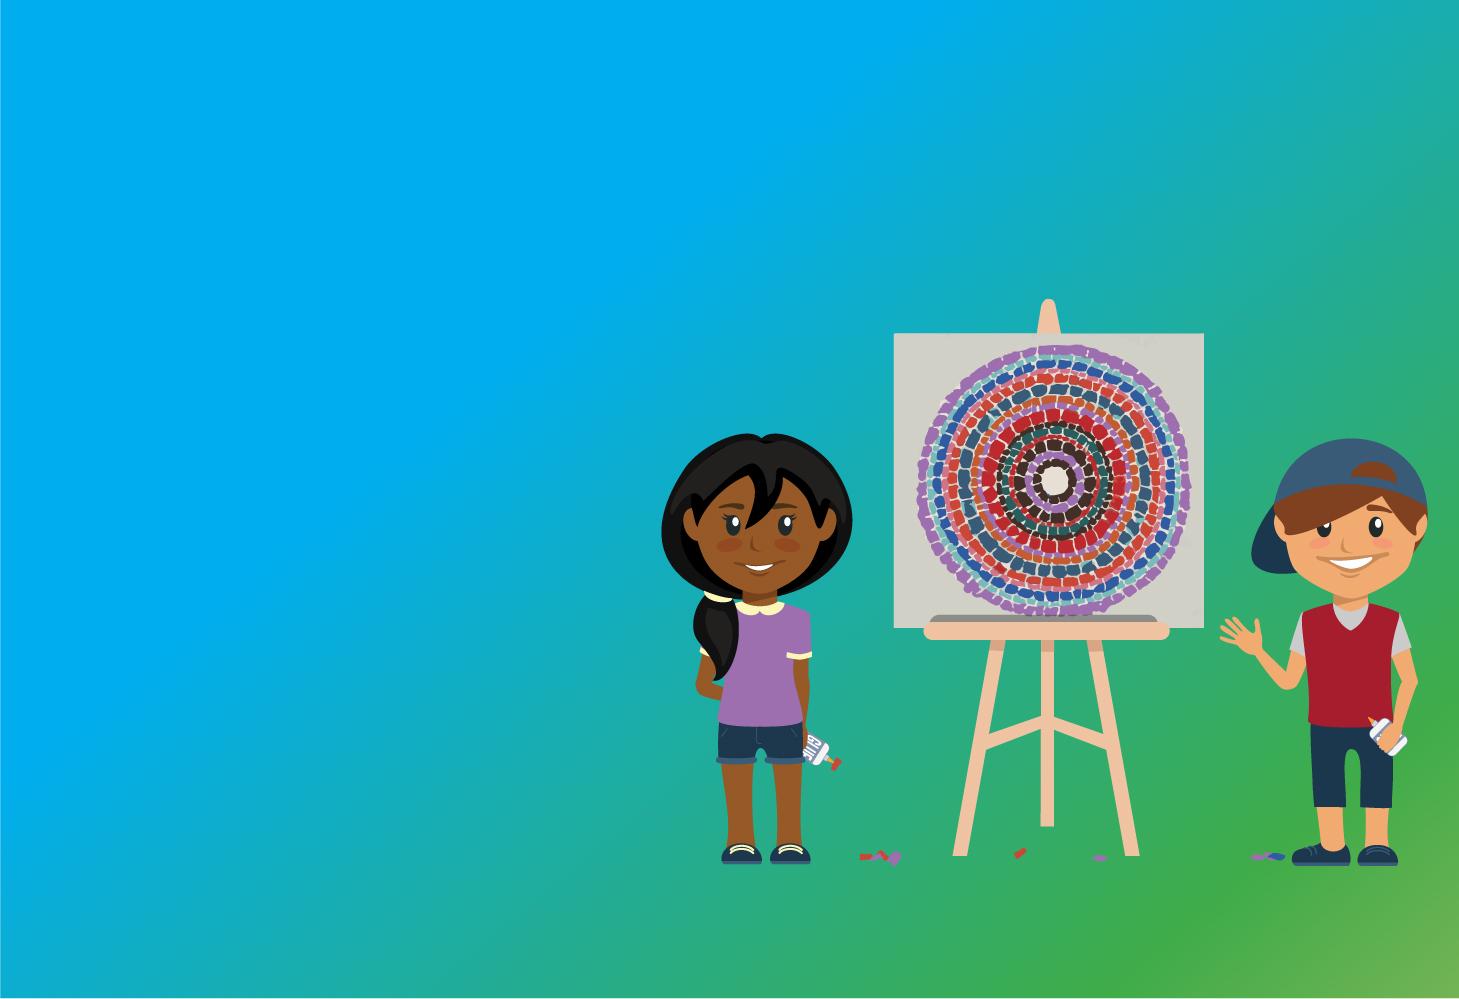 Creative Arts 4 KIDS × Alma Thomas